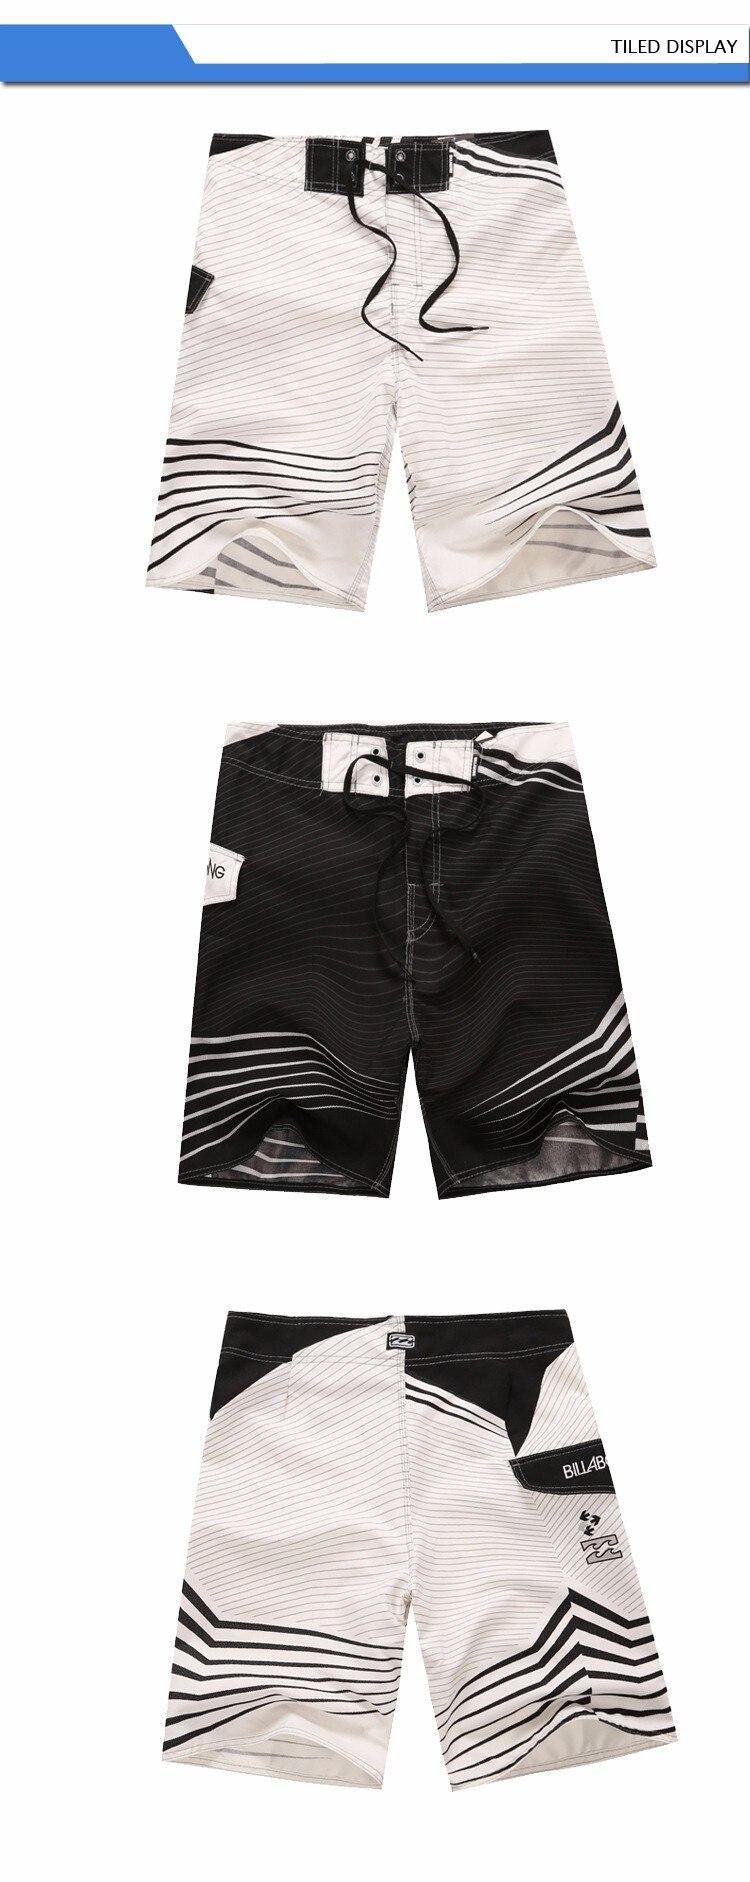 235f7116e4 Whosale 2018 New Hot Mens Shorts Surf Board Shorts Summer Sport ...